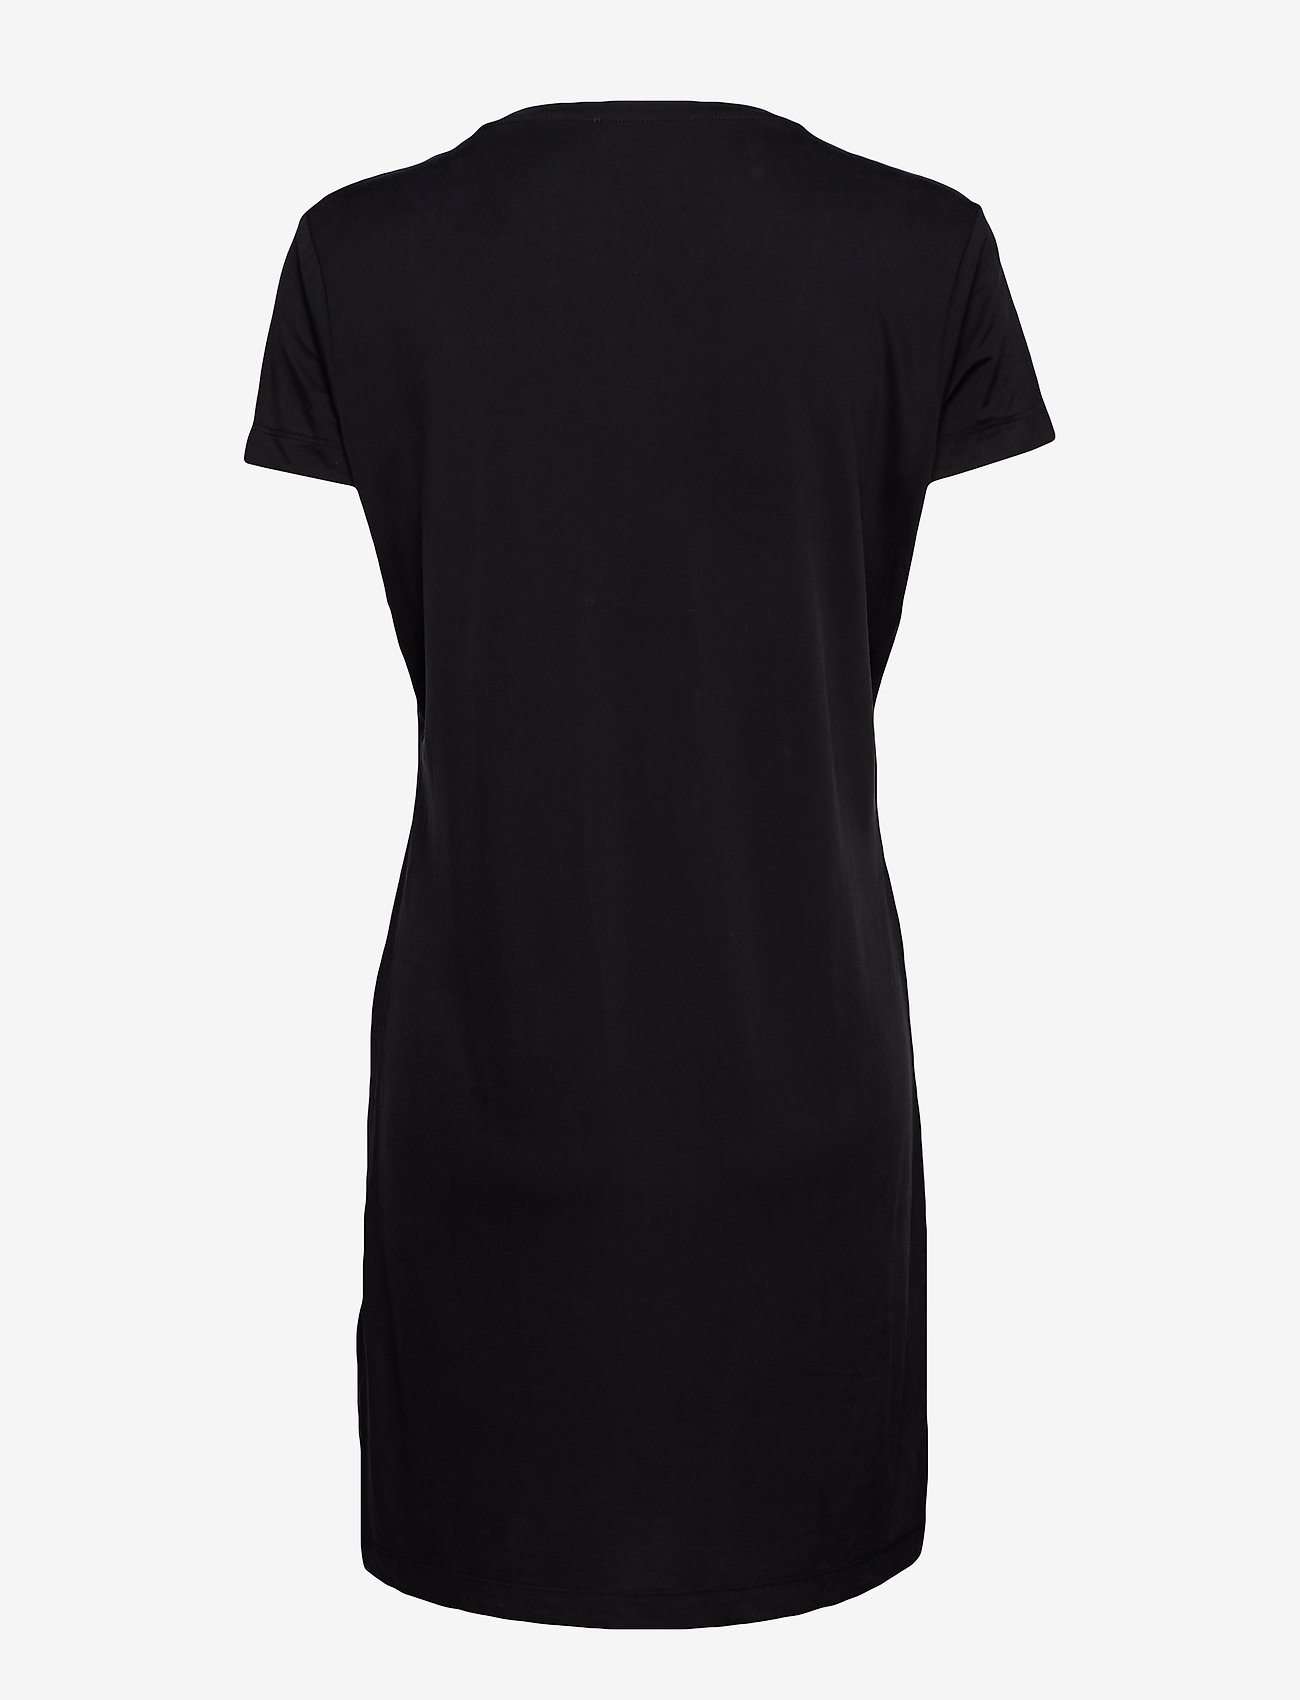 Samsøe Samsøe - Siff dress 6202 - sukienki do kolan i midi - black - 1